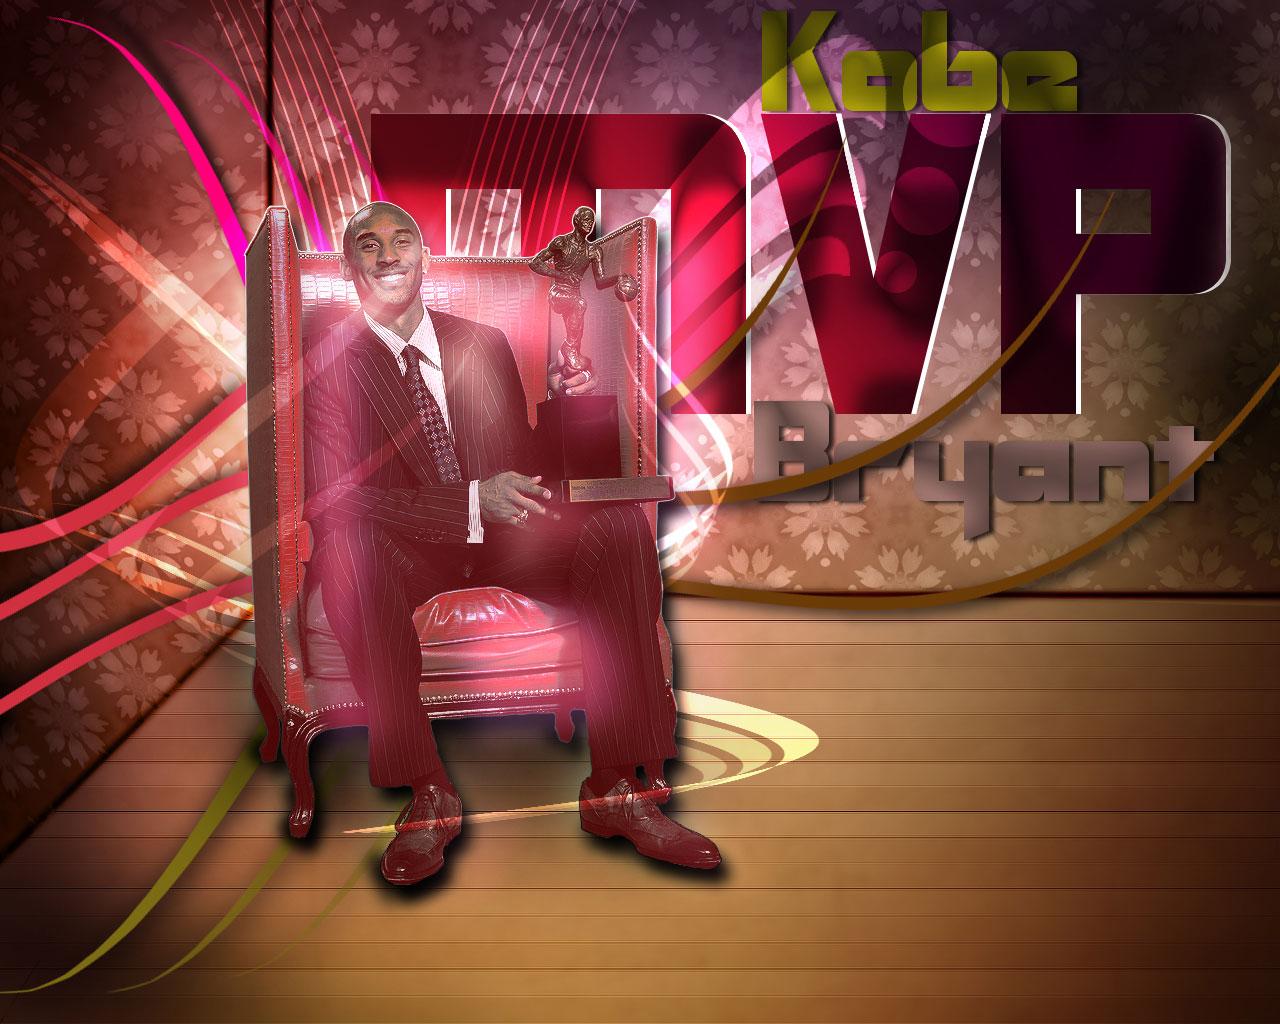 Kobe-Bryant-2008-MVP-Wallpaper.jpg